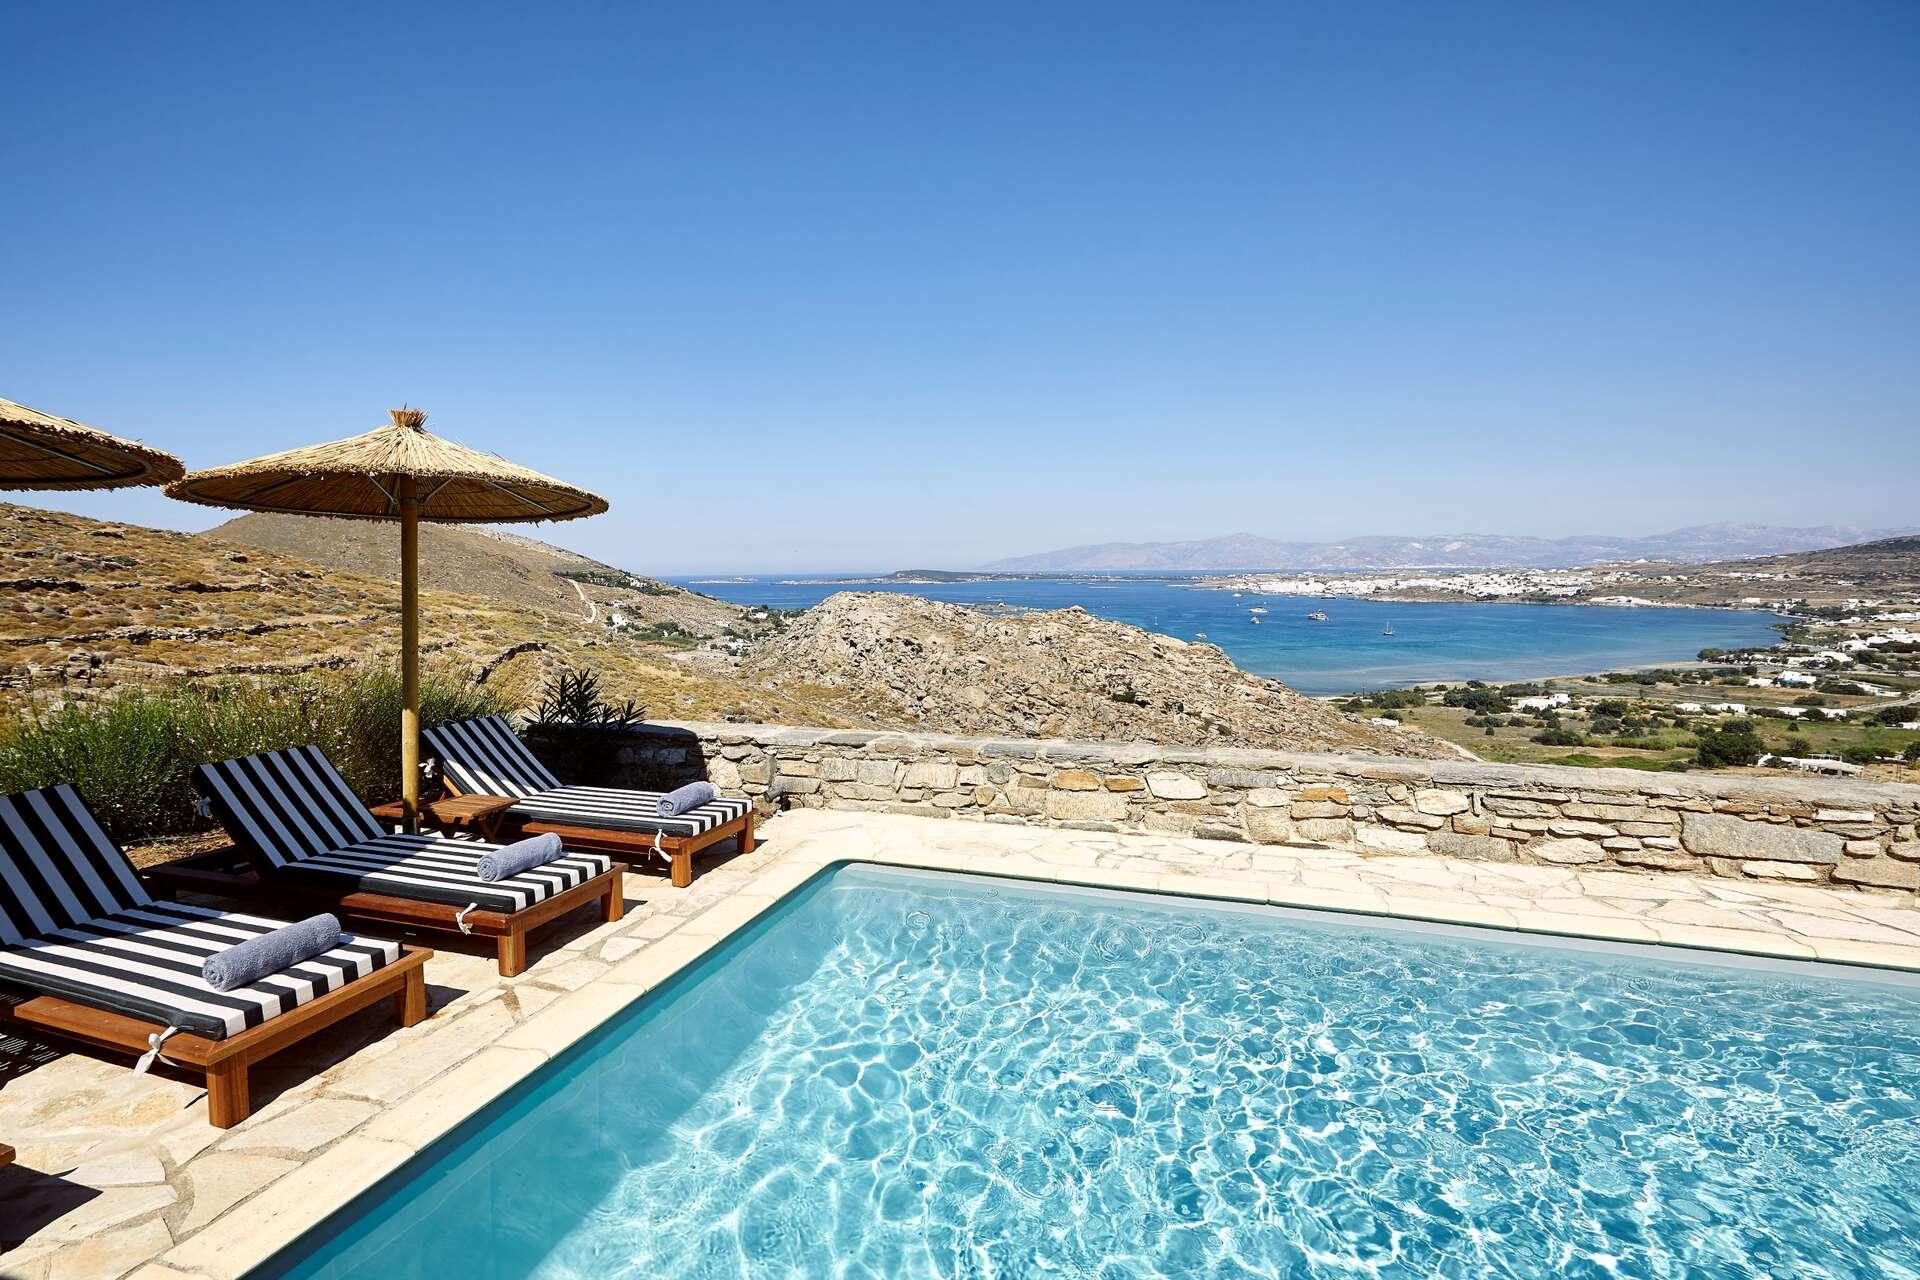 Luxury vacation rentals europe - Greece - Par os - Kolympithres - Indigo Villa - Image 1/12